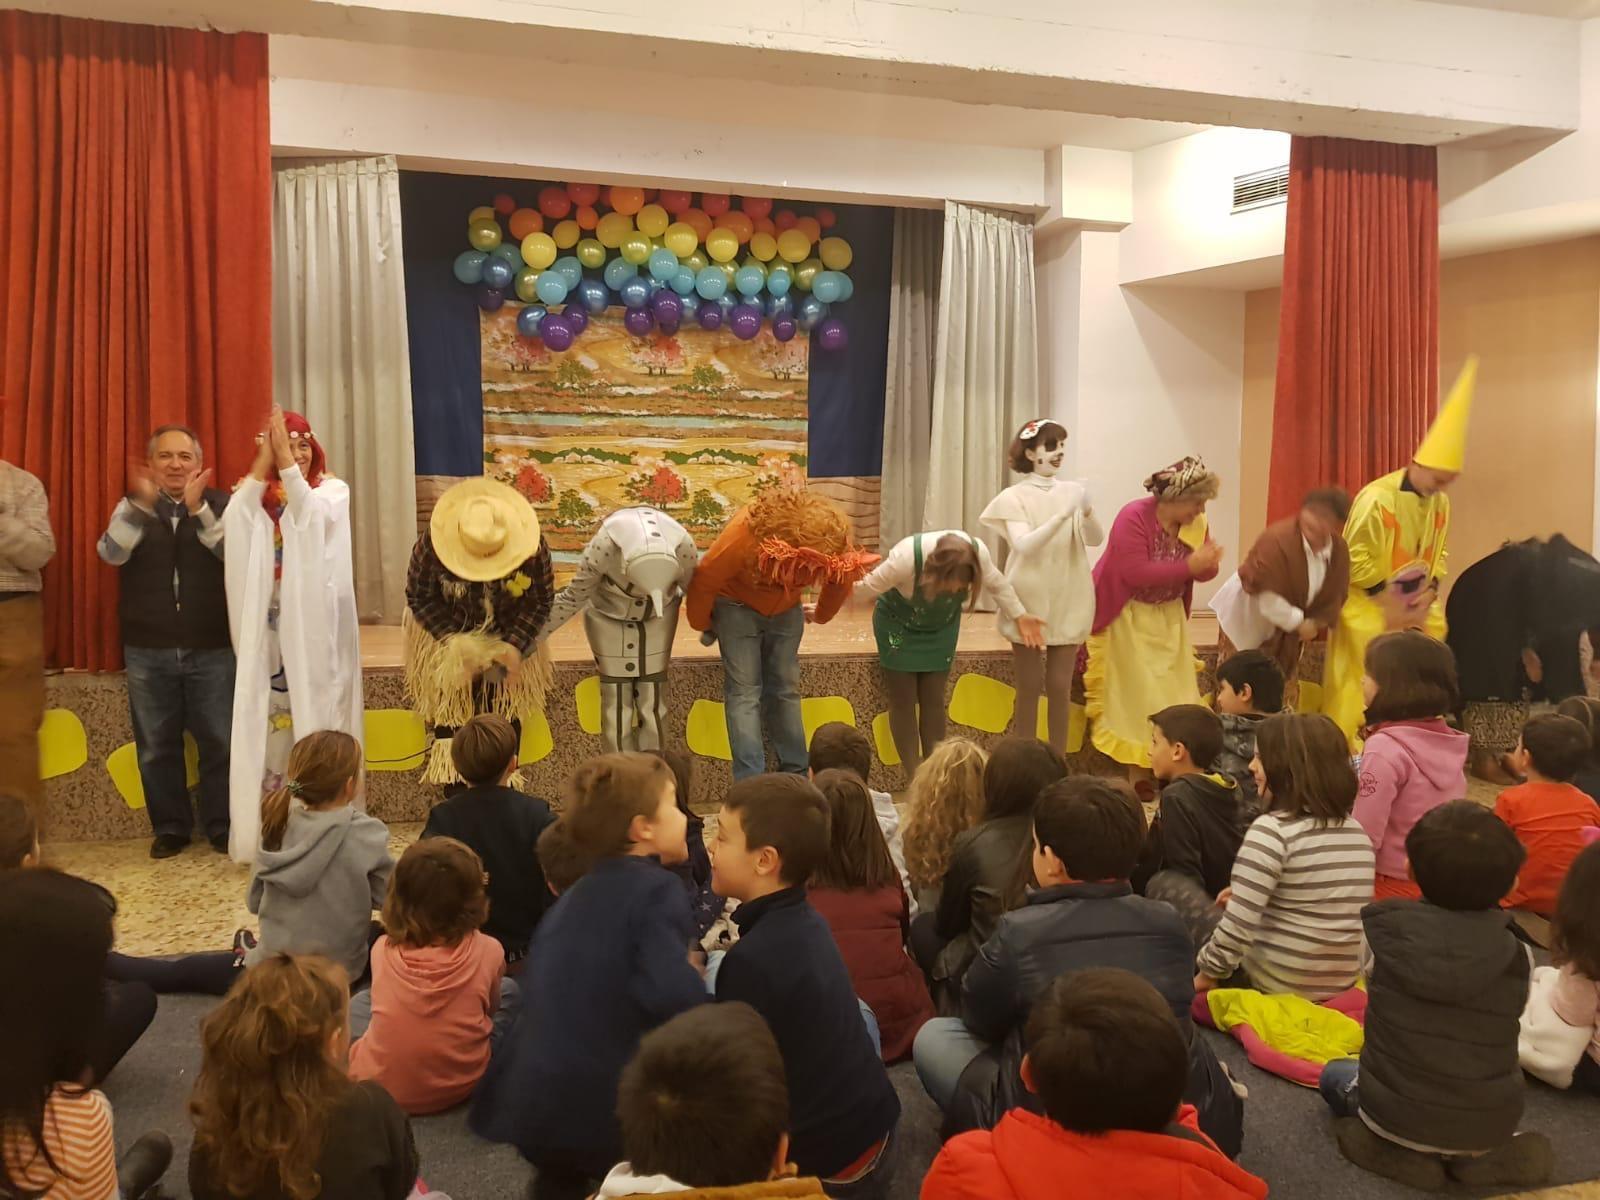 teatro-sange-mago-de-oz-2019-reyes-magos-3